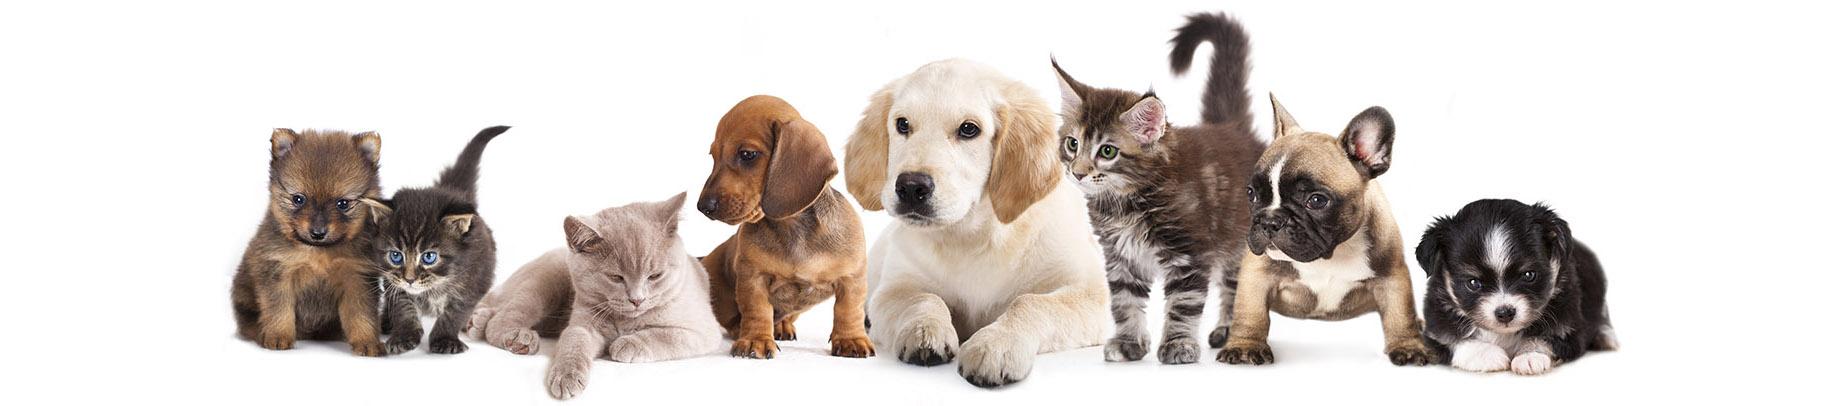 Cachorro de gatos